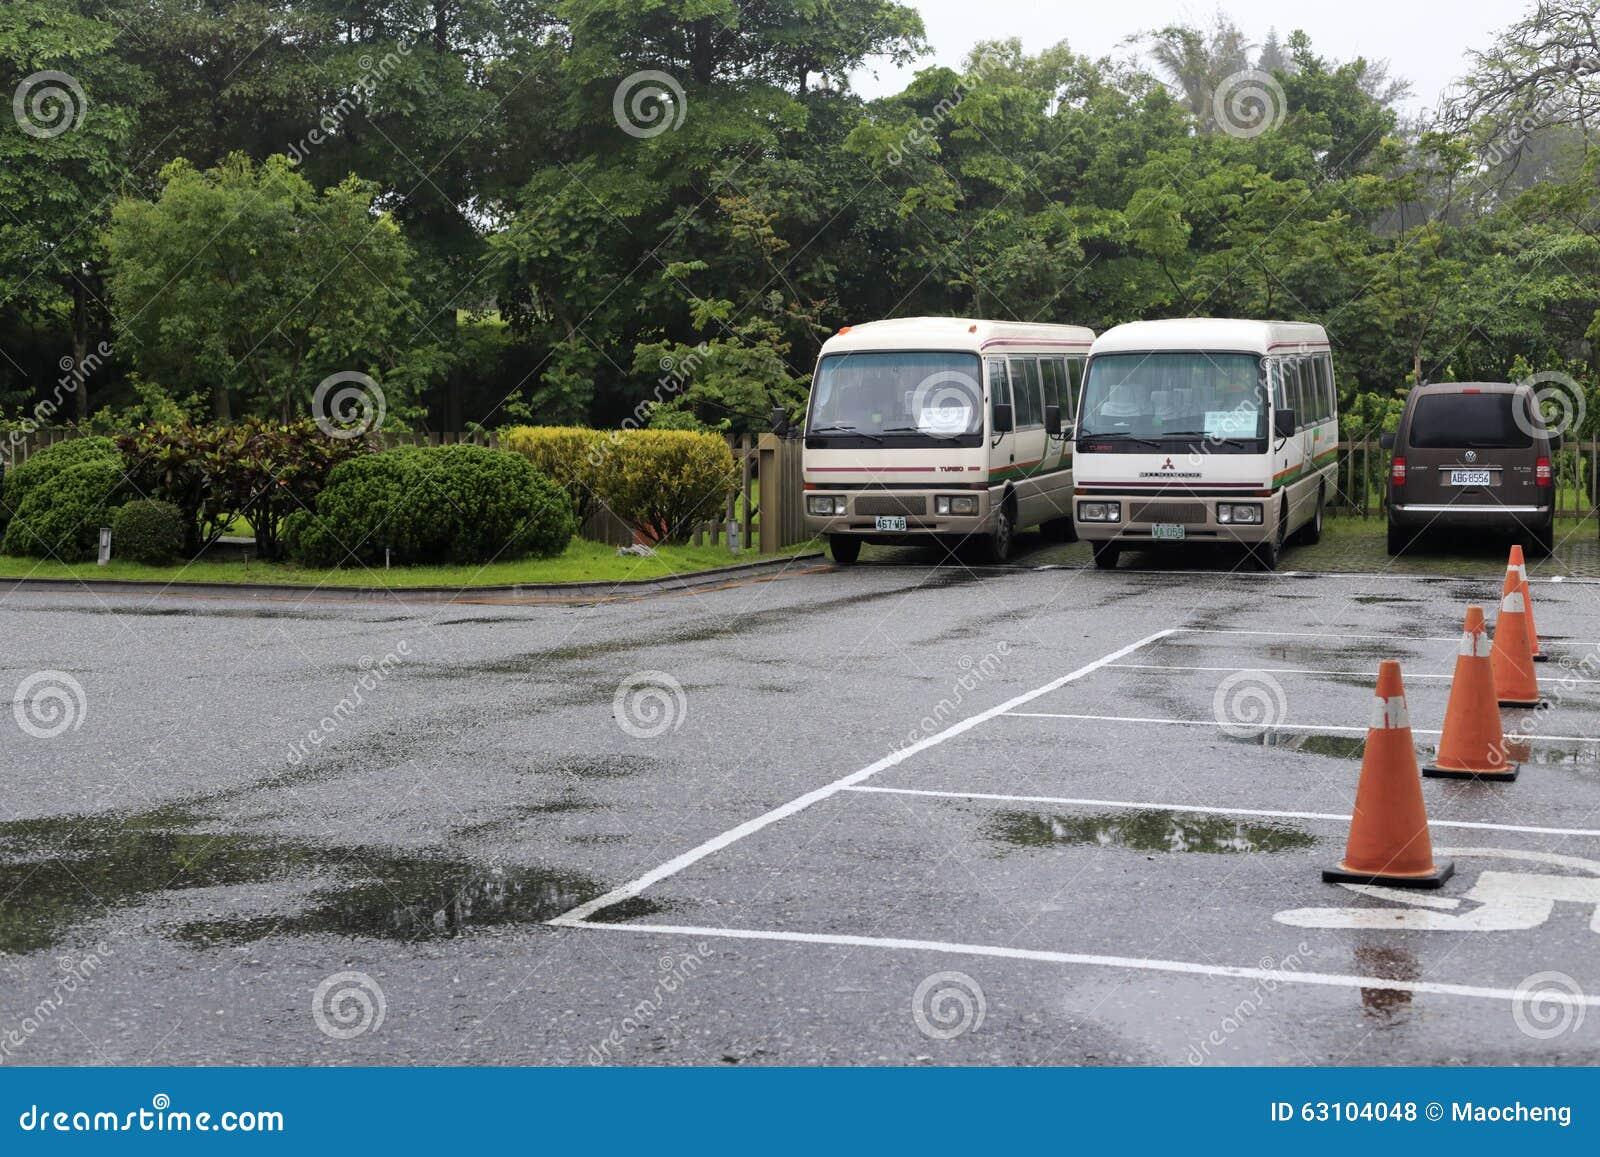 small car lot business plan